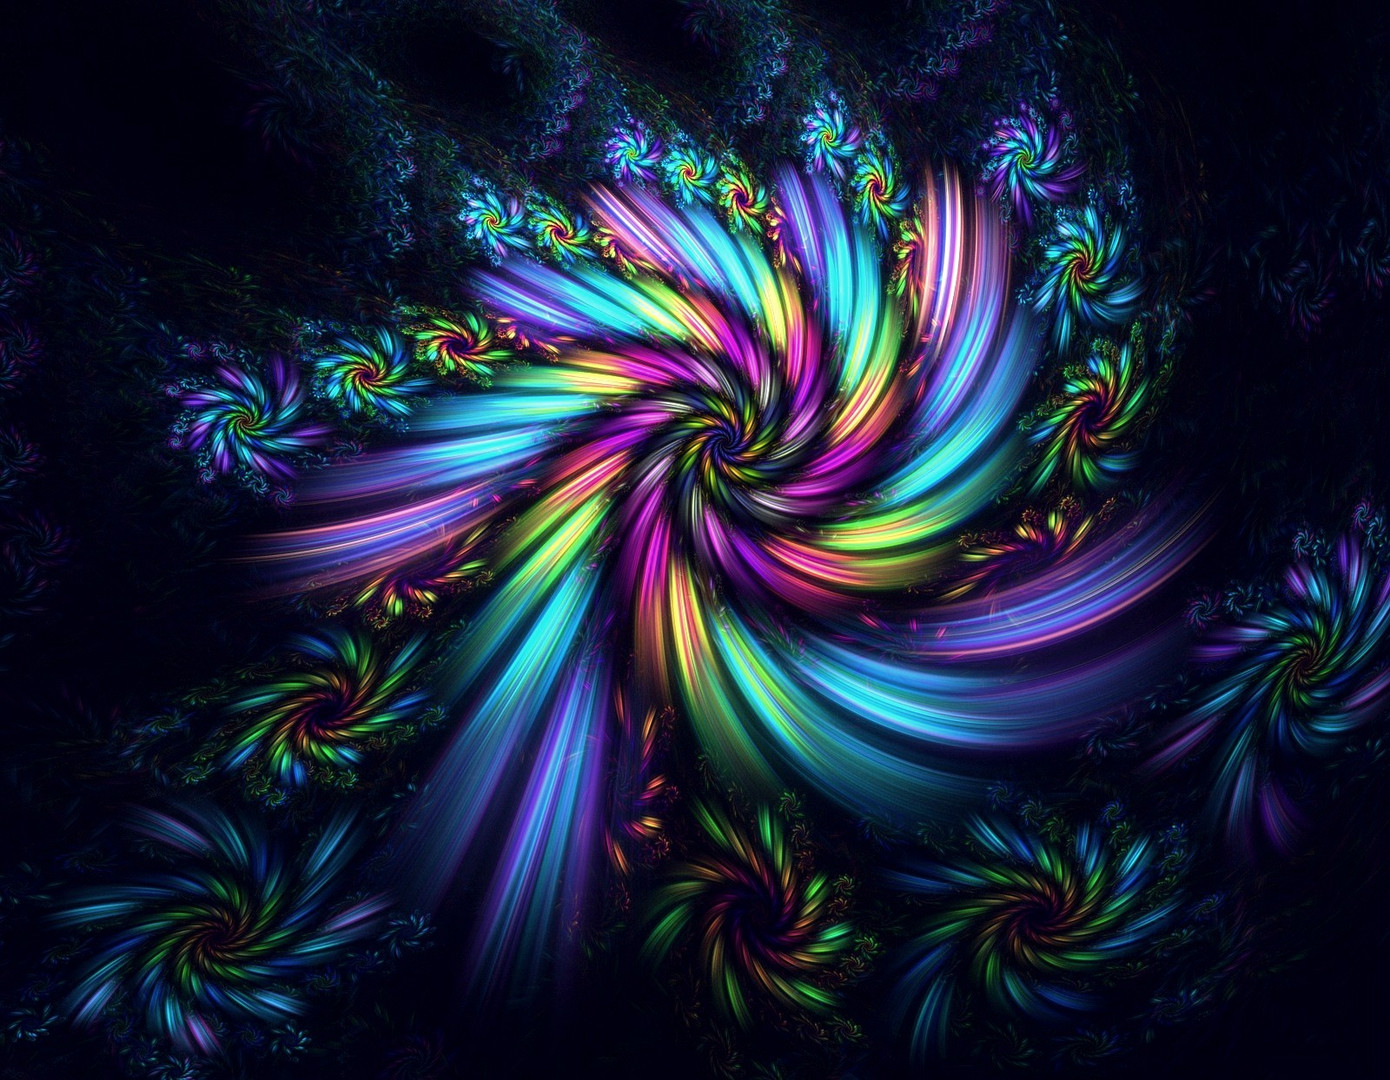 Regenbogen-Fantasie